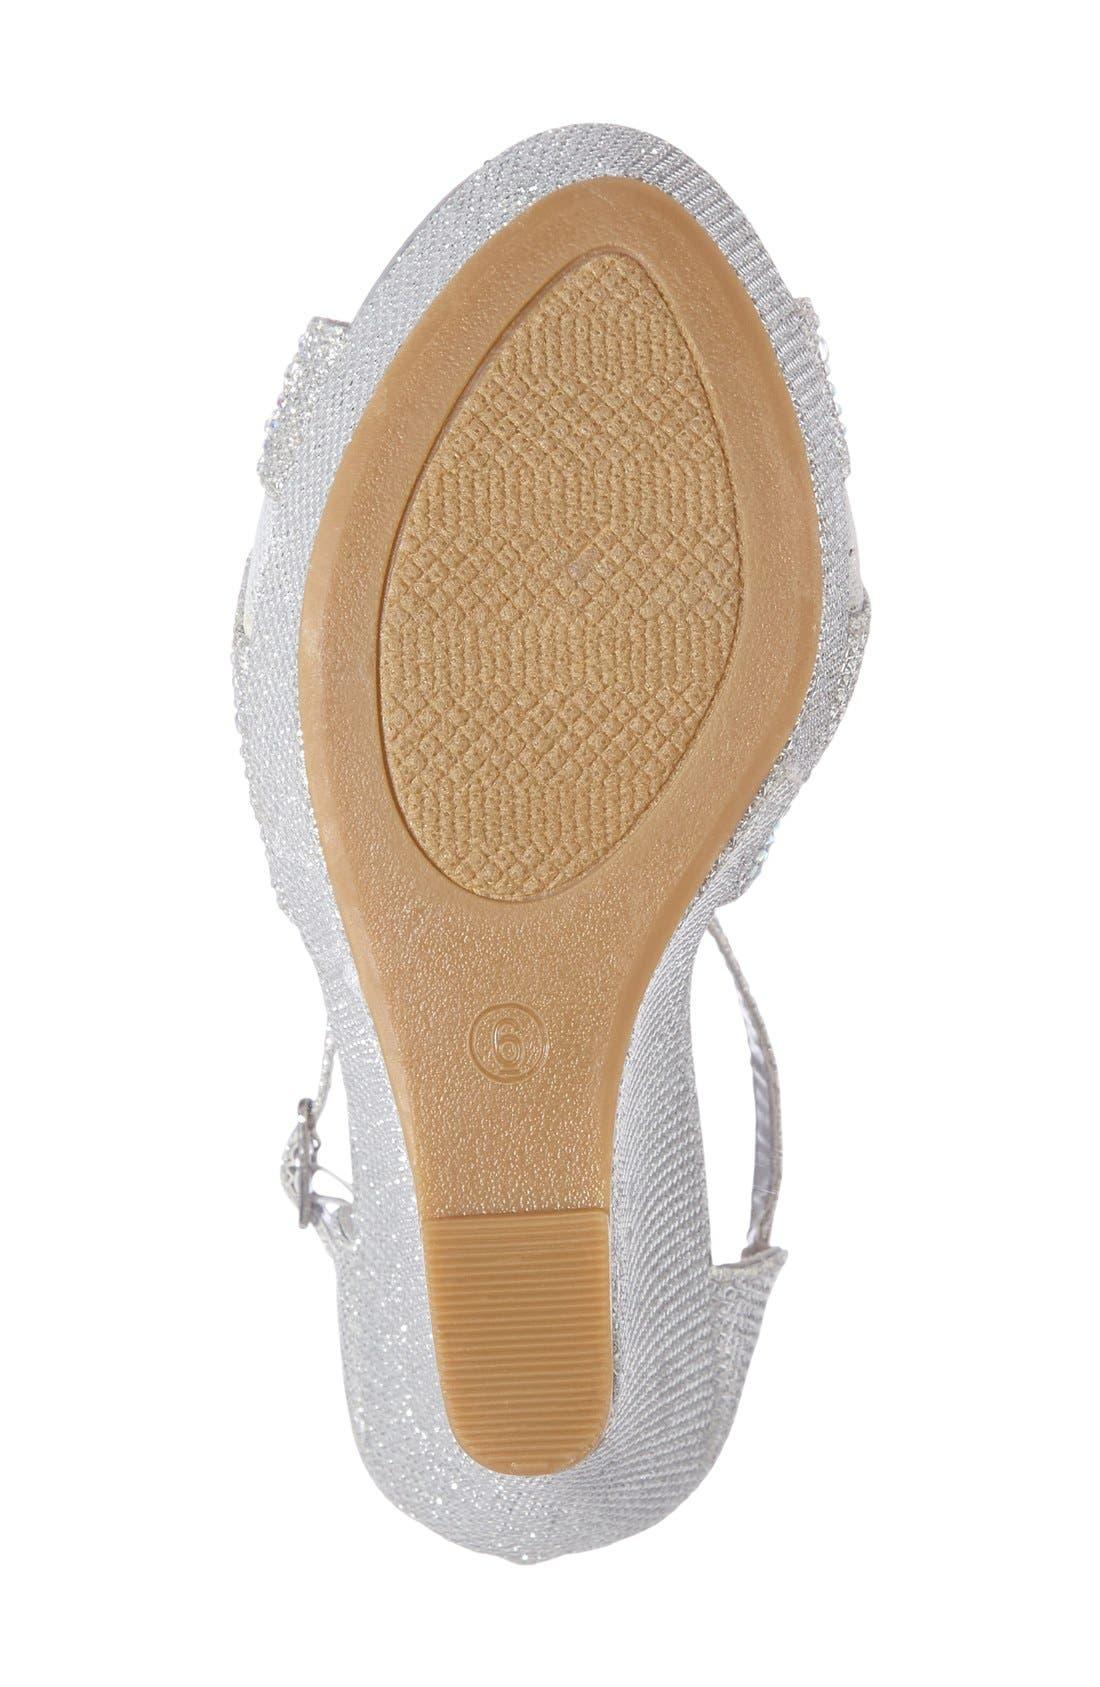 Ness Crystal Embellished Wedge Sandal,                             Alternate thumbnail 5, color,